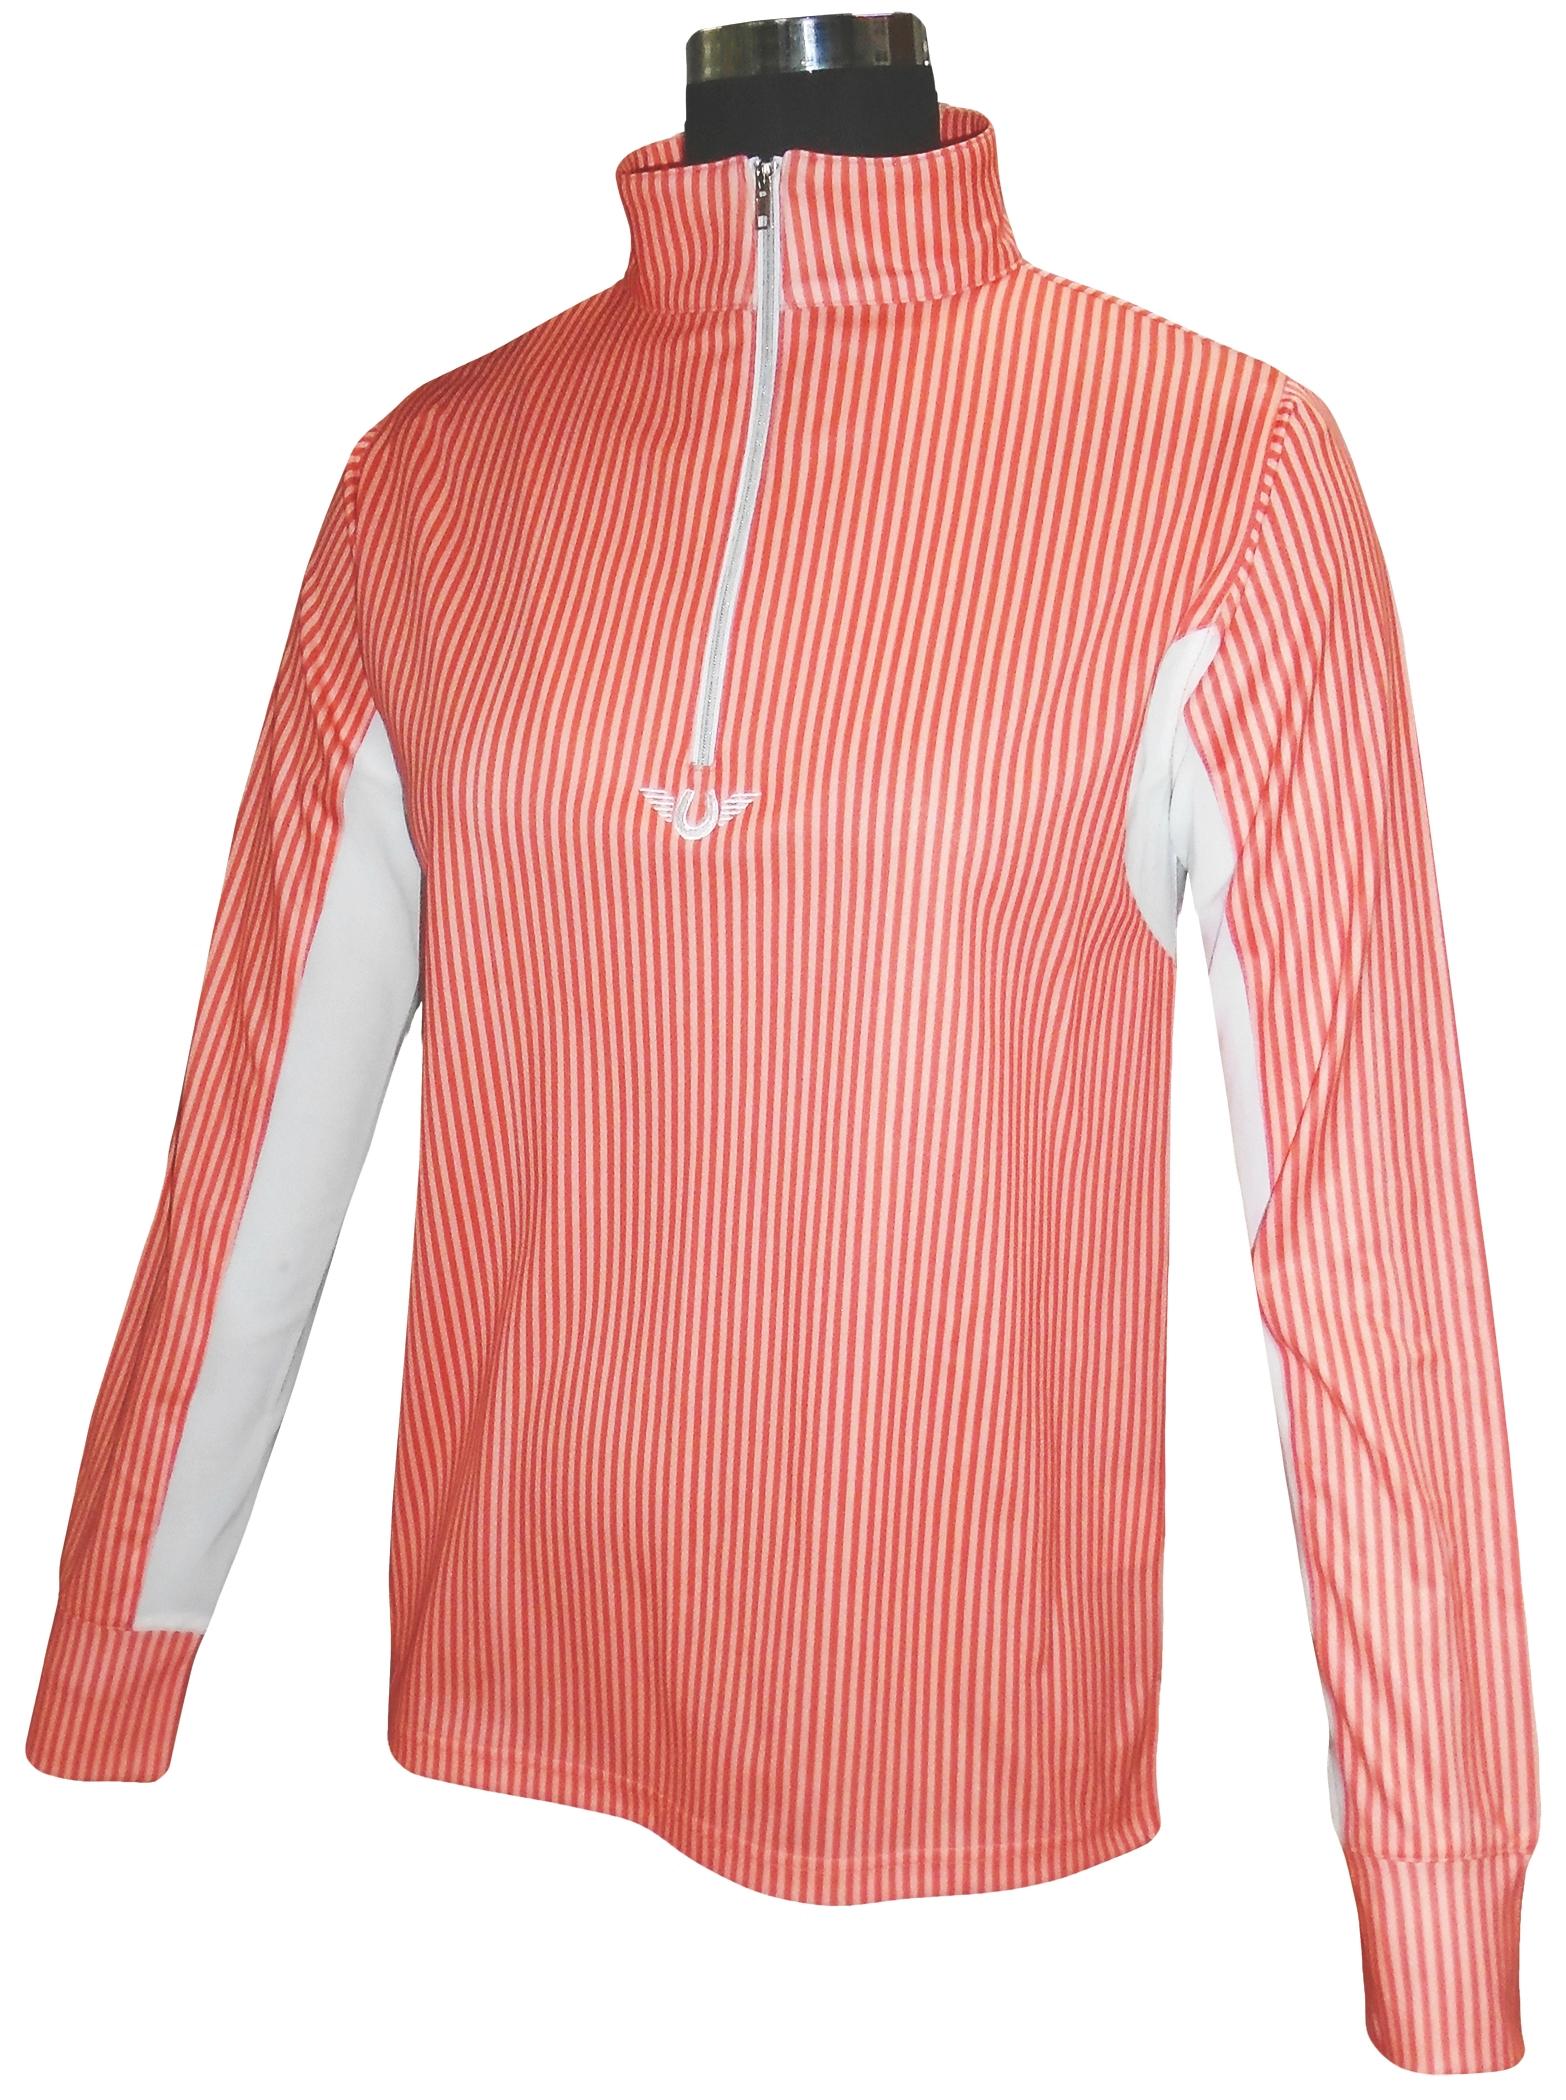 TuffRider Ladies' Neon Stripe Long Sleeve Technical Shirt